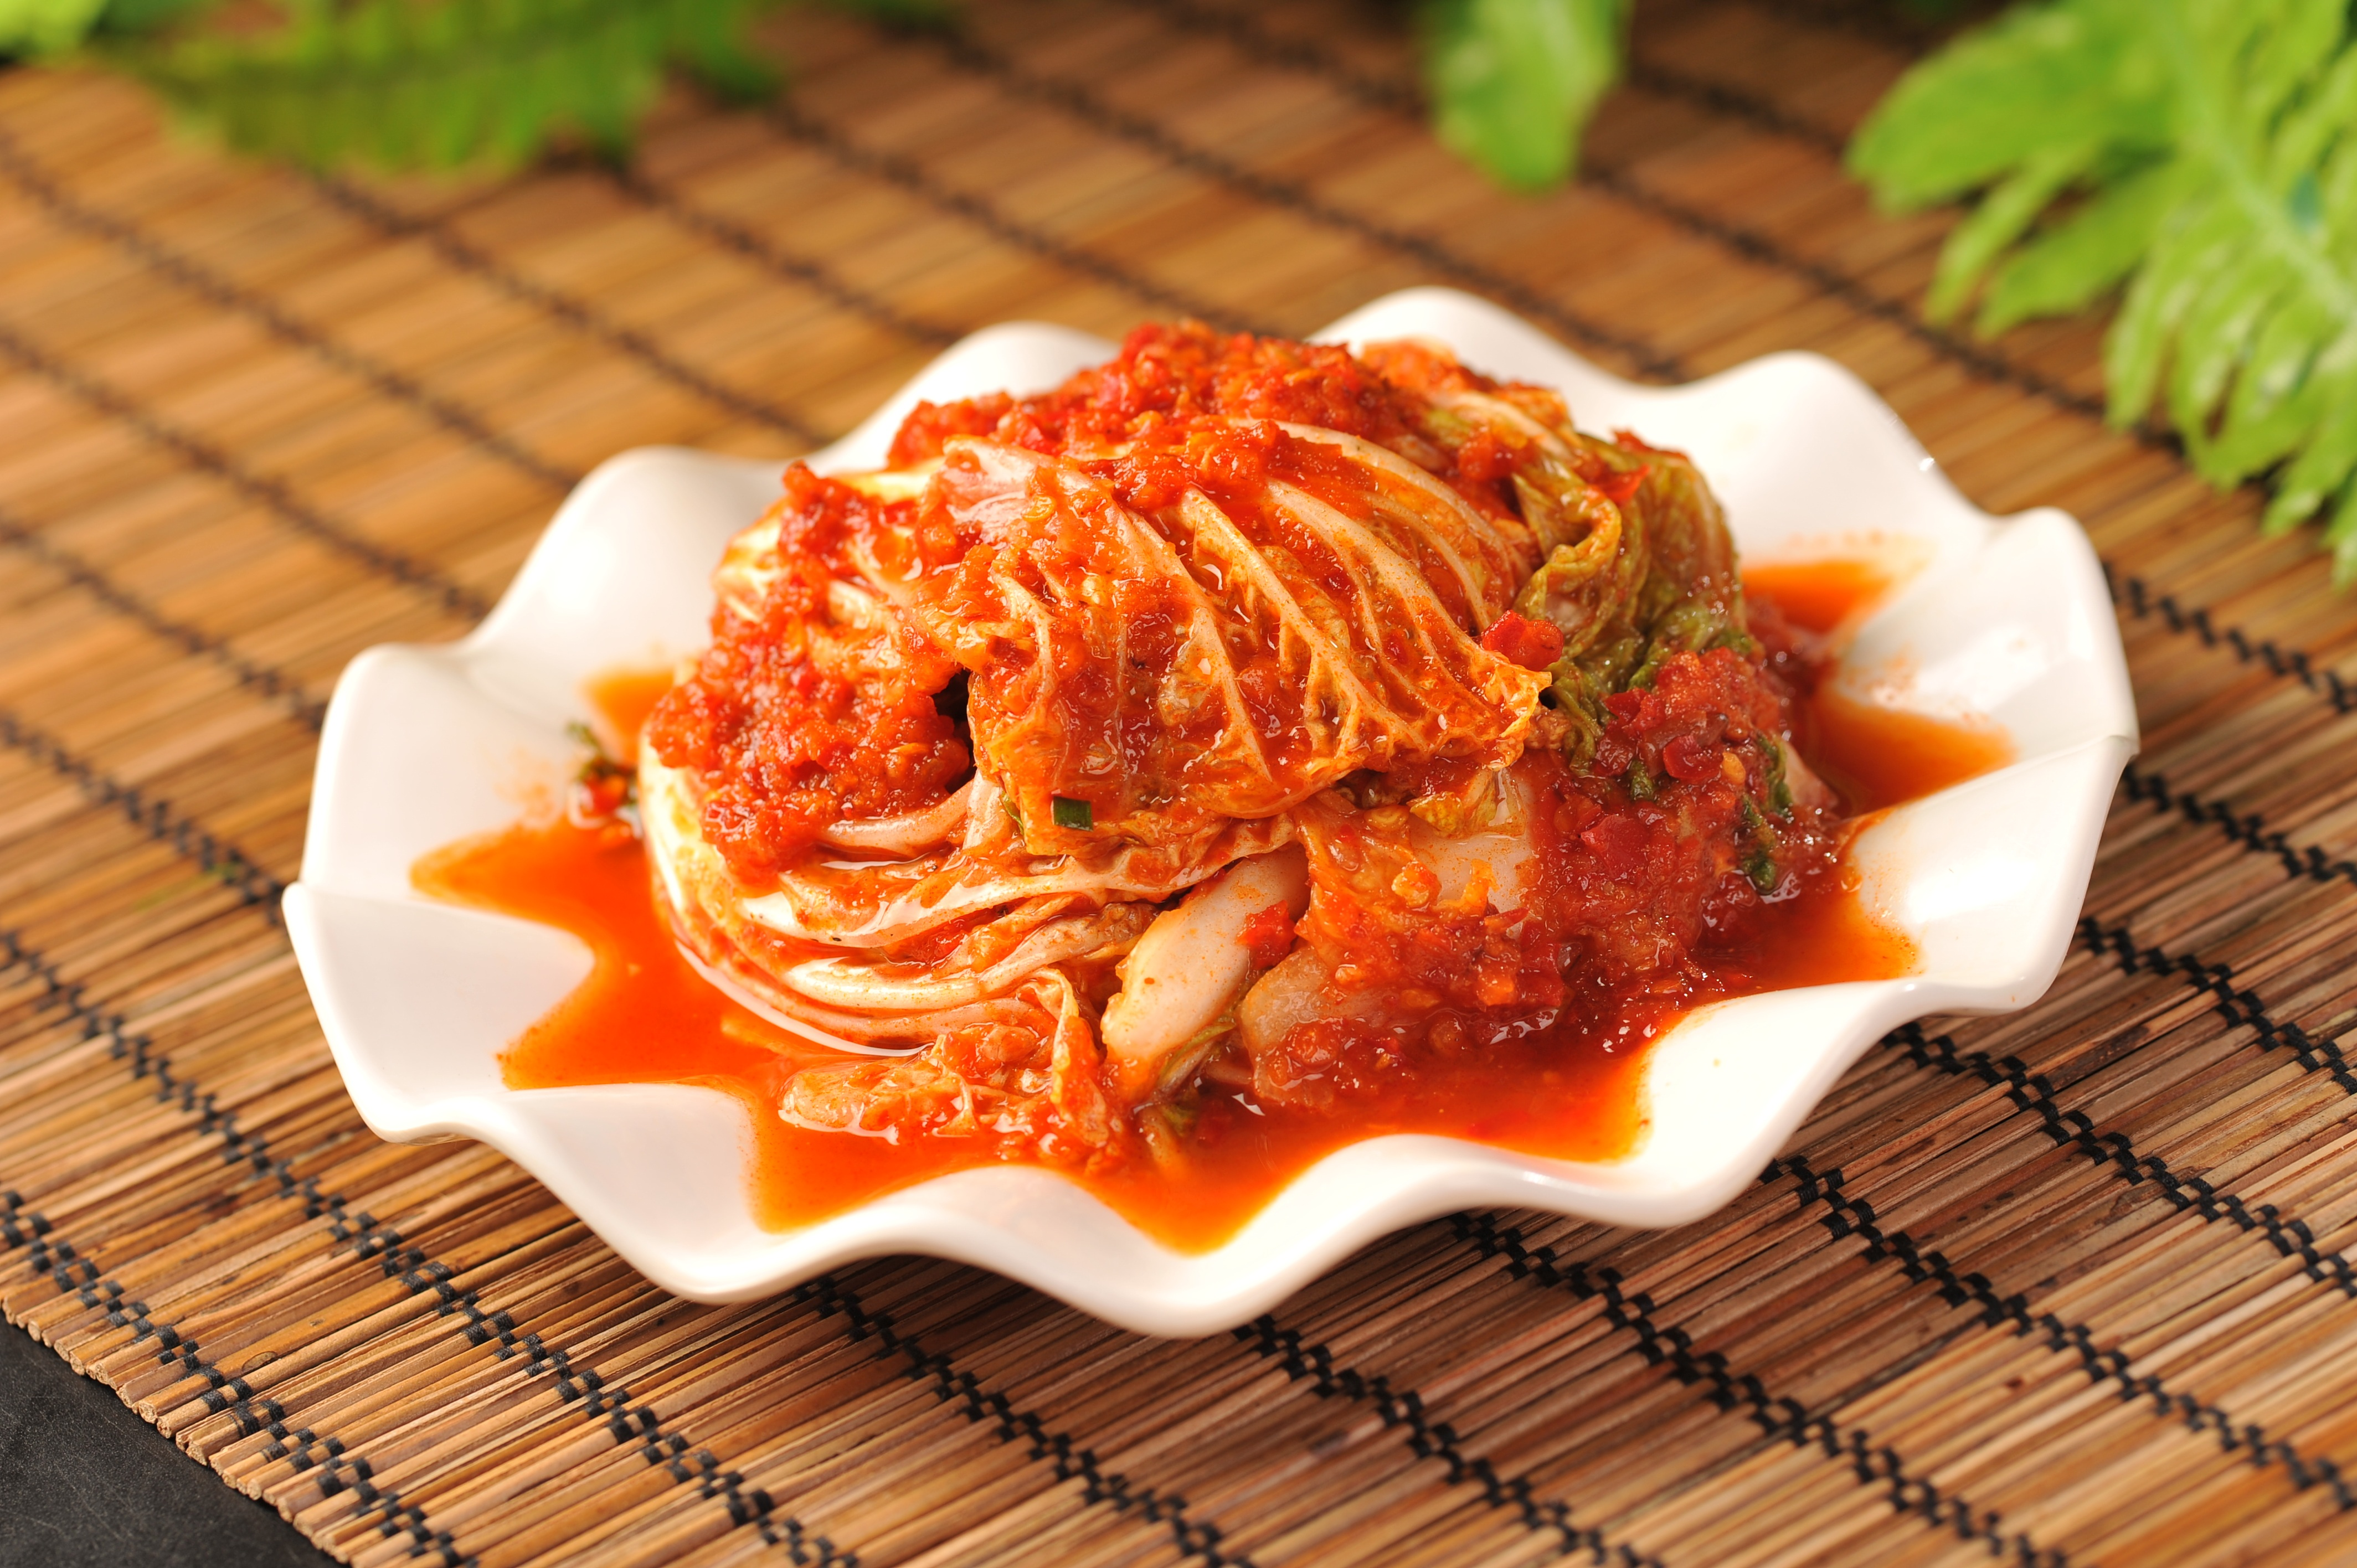 dish-food-produce-asia-meat-cuisine-833171-pxhere.com